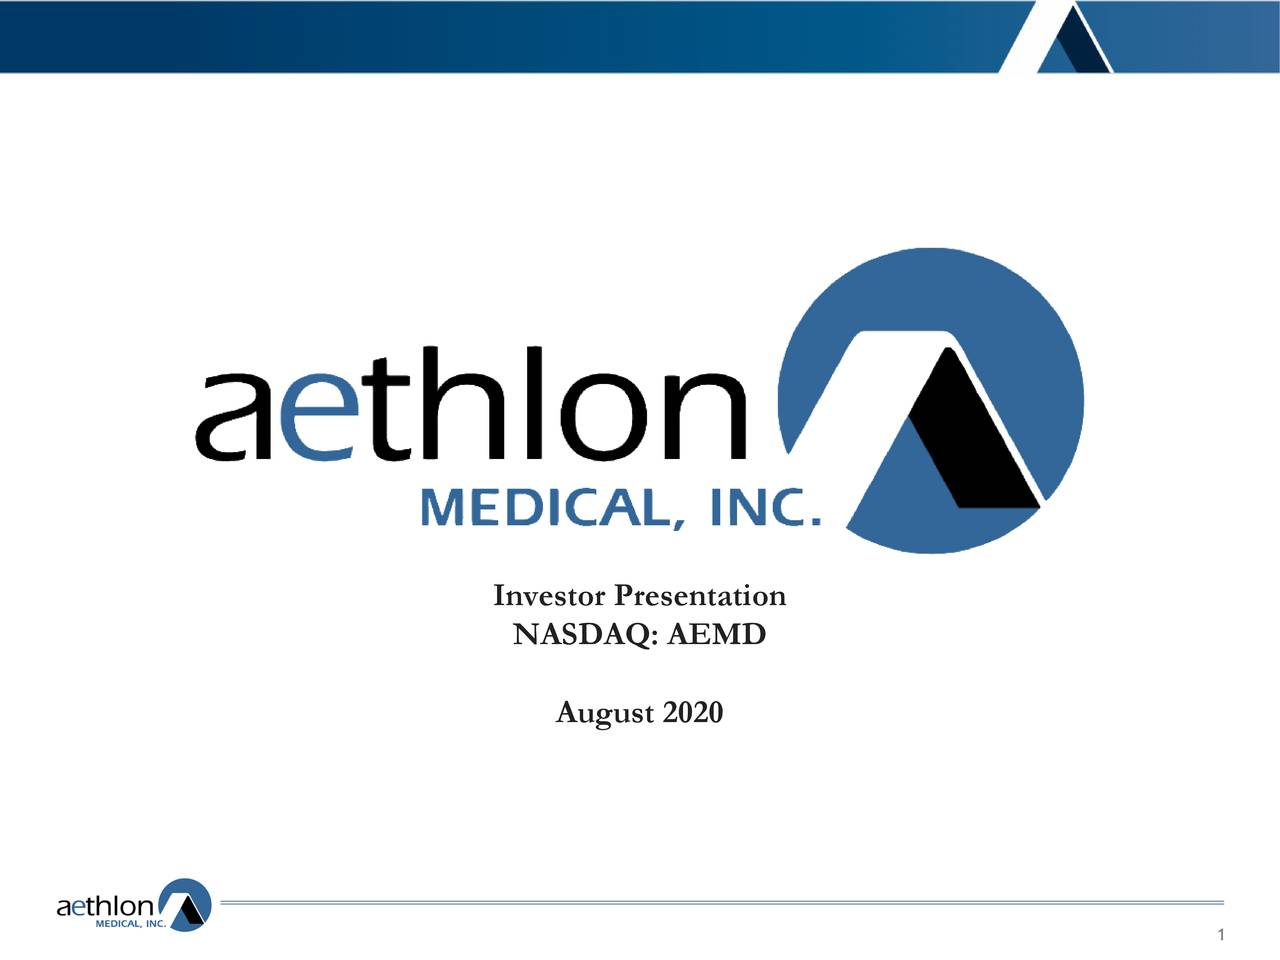 Aethlon Medical (AEMD) Investor Presentation - Slideshow